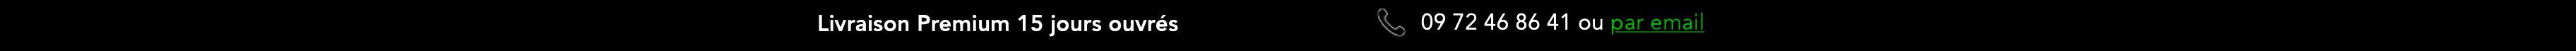 contactneowood